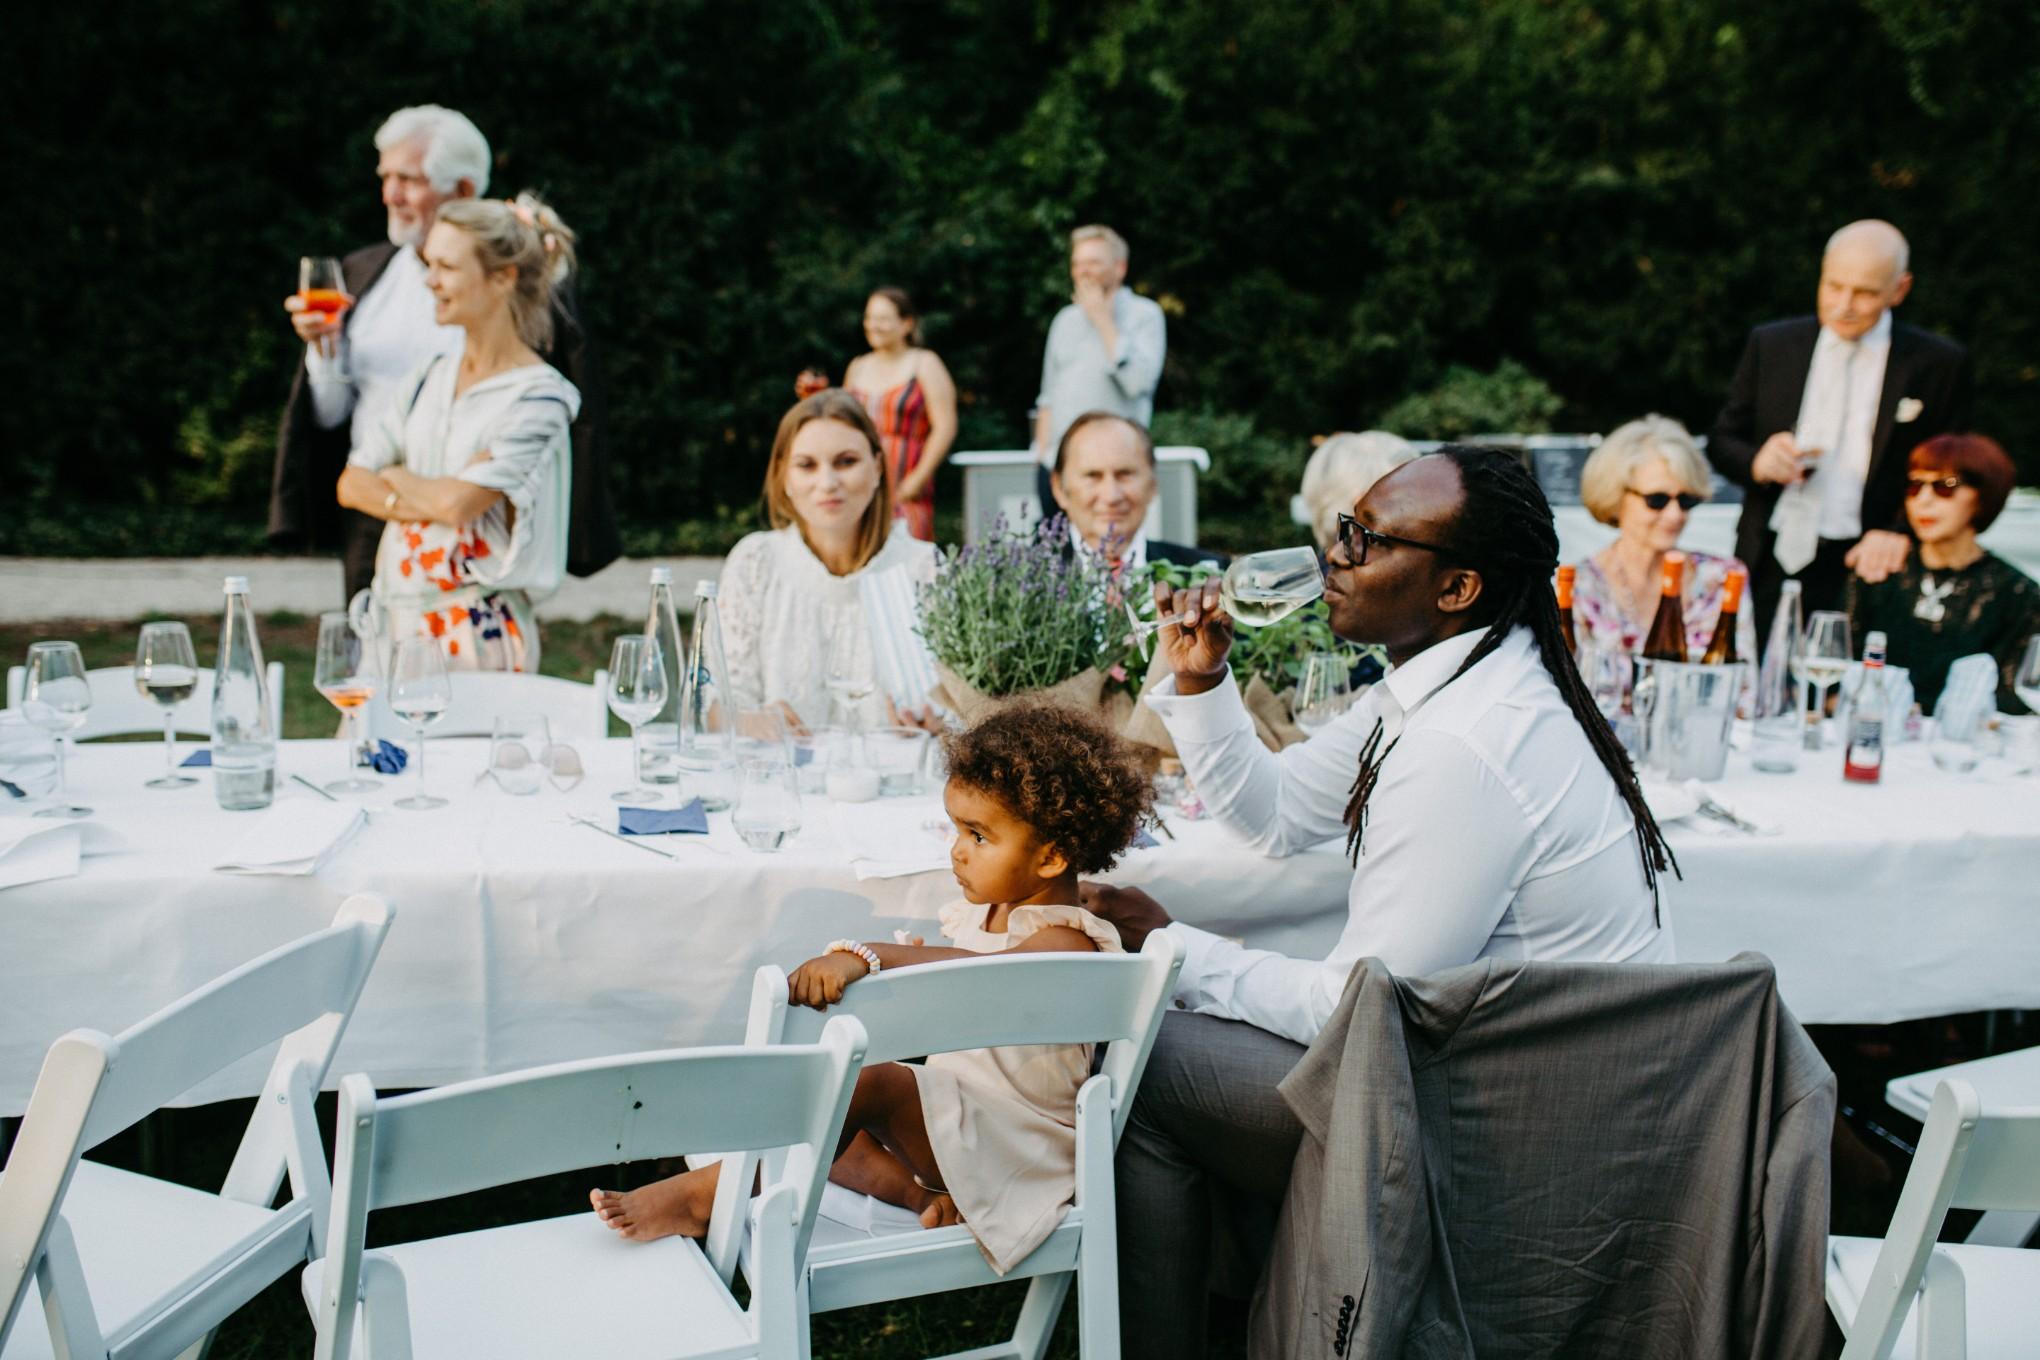 Berlin-Wannsee-Pia-Anna-Christian-Wedding-Photography-ST-75.jpg